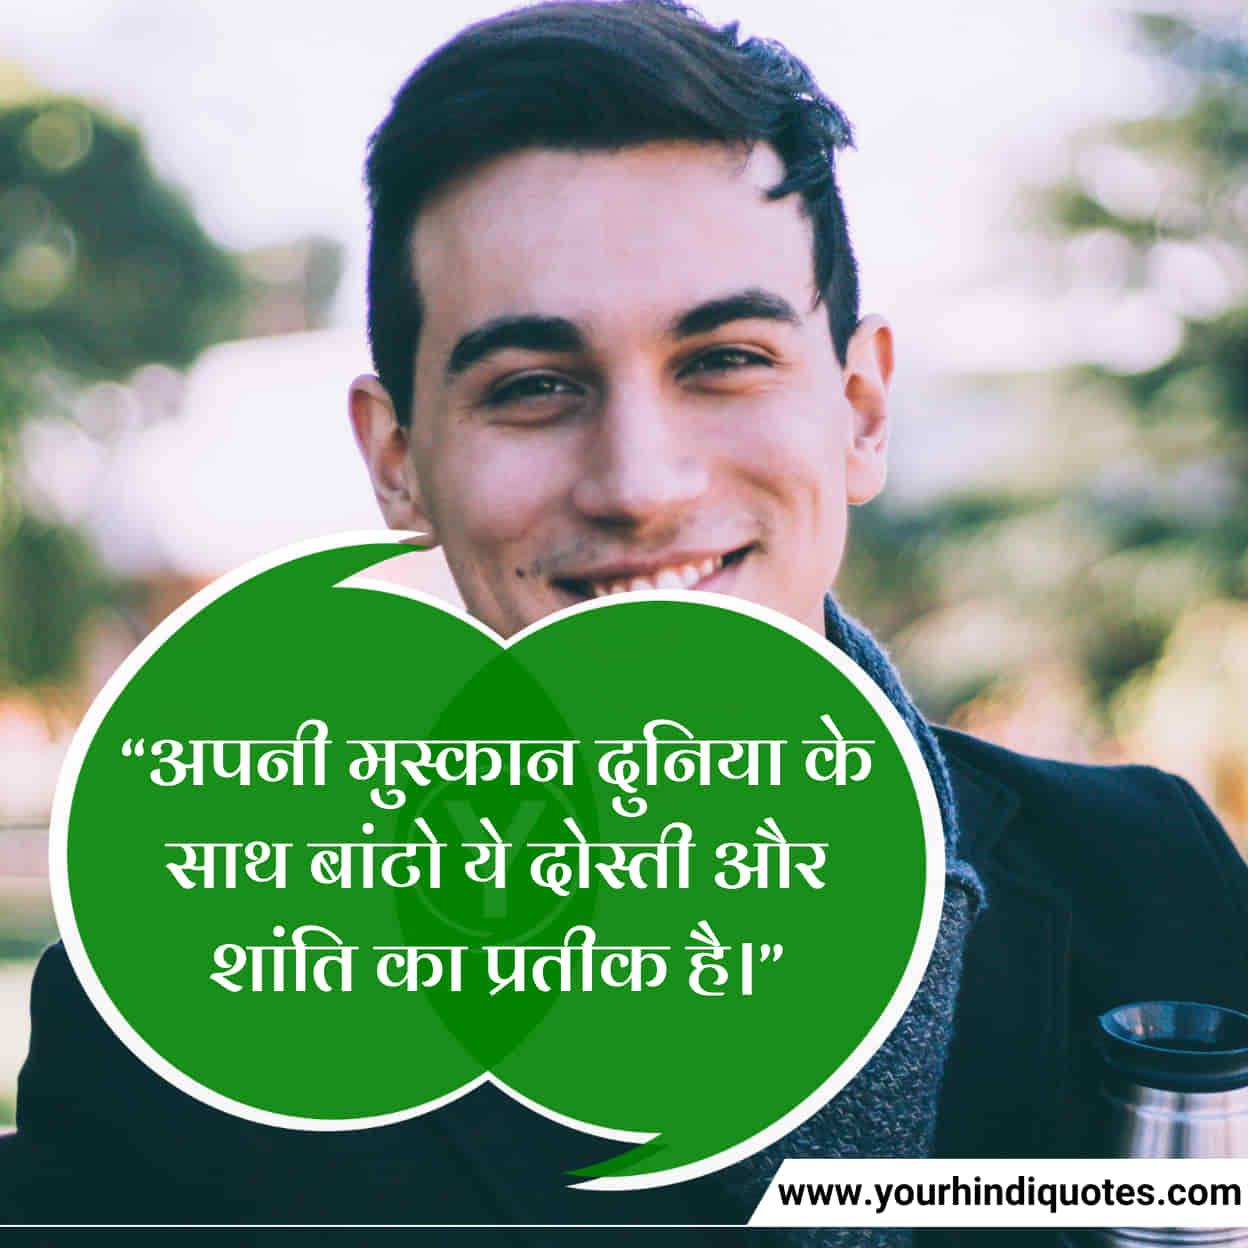 Beautiful Happy Smile Quotes